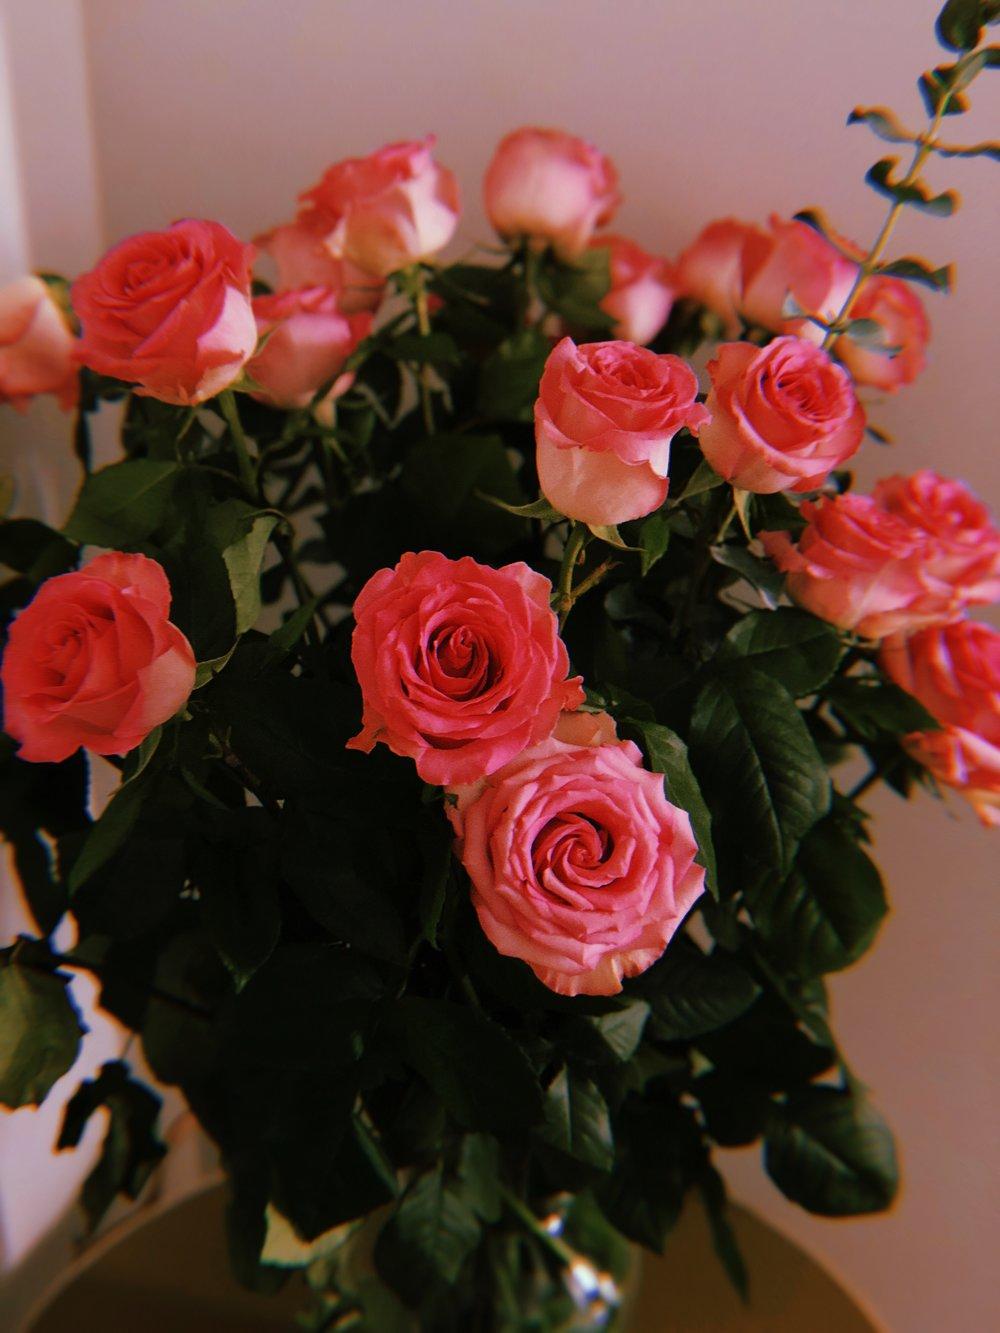 snackface-nyc-roses.jpg